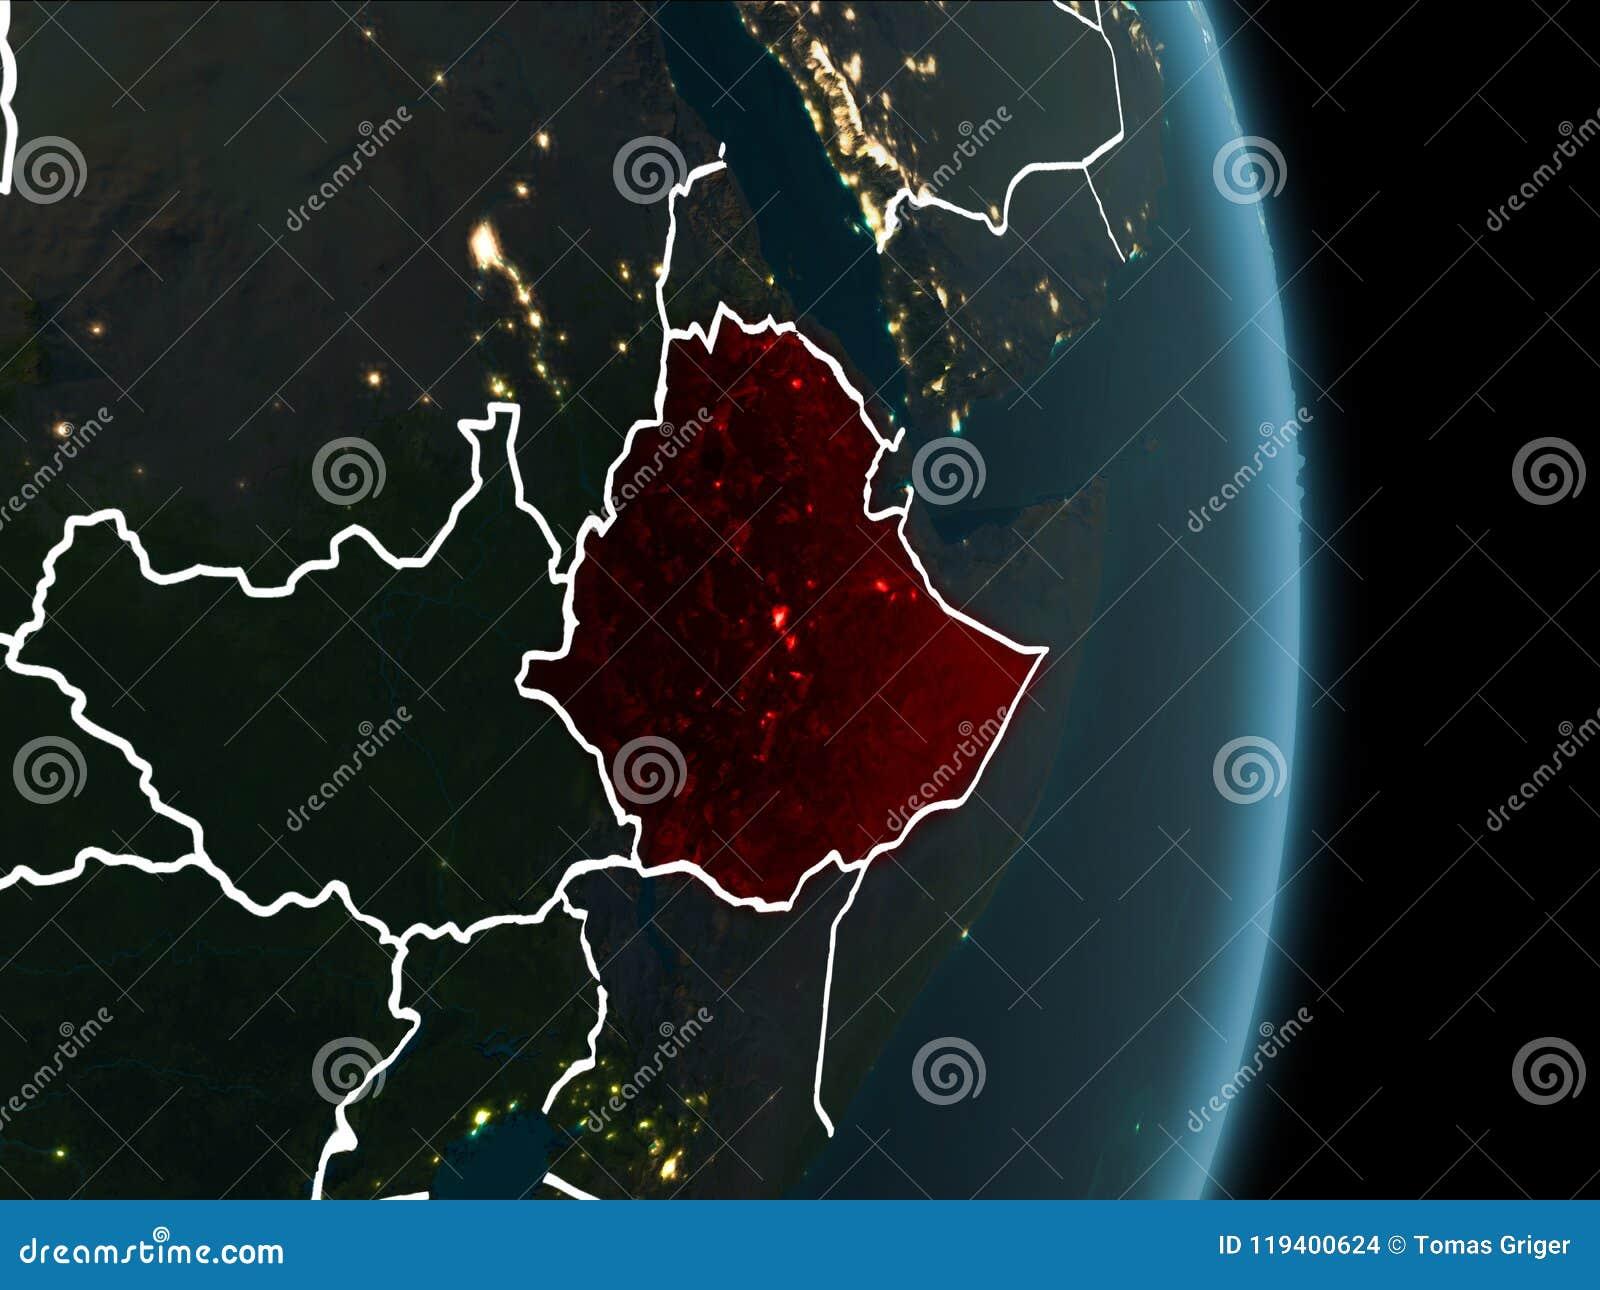 Orbit View Of Ethiopia At Night Stock Illustration ... on capital of ethiopia, afar region ethiopia, elevation of ethiopia, national flag of ethiopia, awash ethiopia, native animal in ethiopia, flora of ethiopia, satellite map kenya, village of ethiopia, city of ethiopia, road map ethiopia, gojjam ethiopia, geographic features of ethiopia, king of ethiopia, food of ethiopia, coordinates of ethiopia, aerial view of ethiopia, sodo ethiopia, nazret ethiopia,